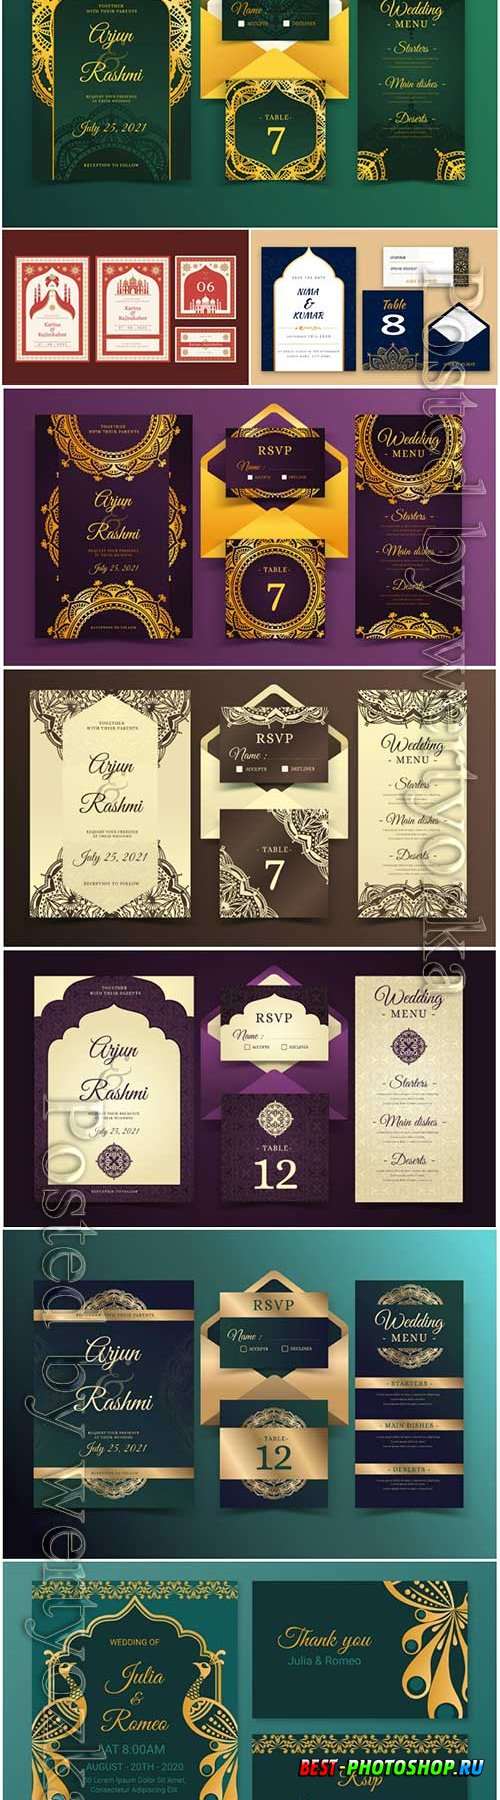 Elegant indian wedding stationery templates vector illustration